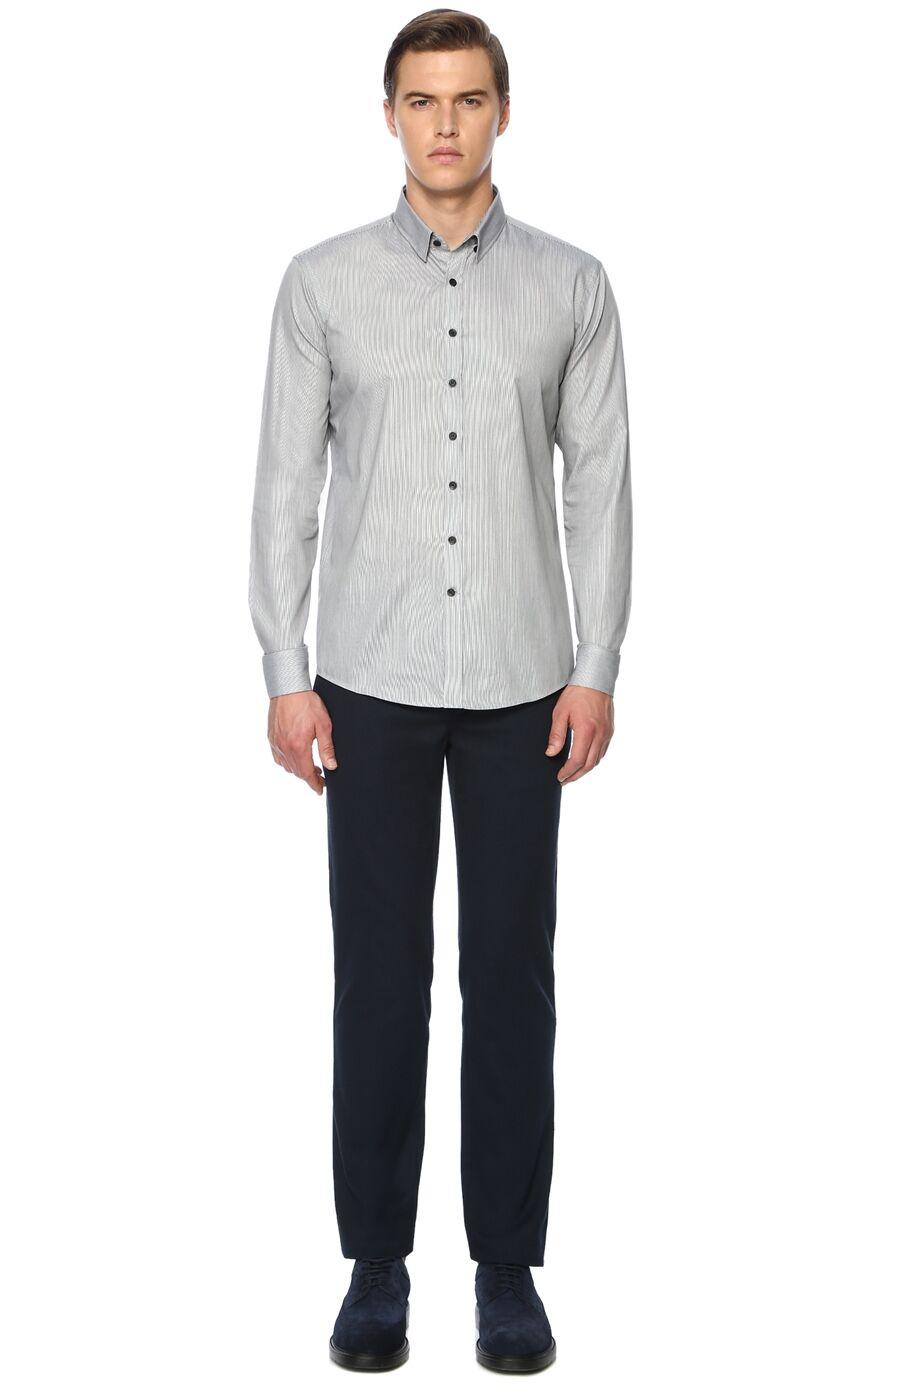 Çizgili Siyah Beyaz Gömlek